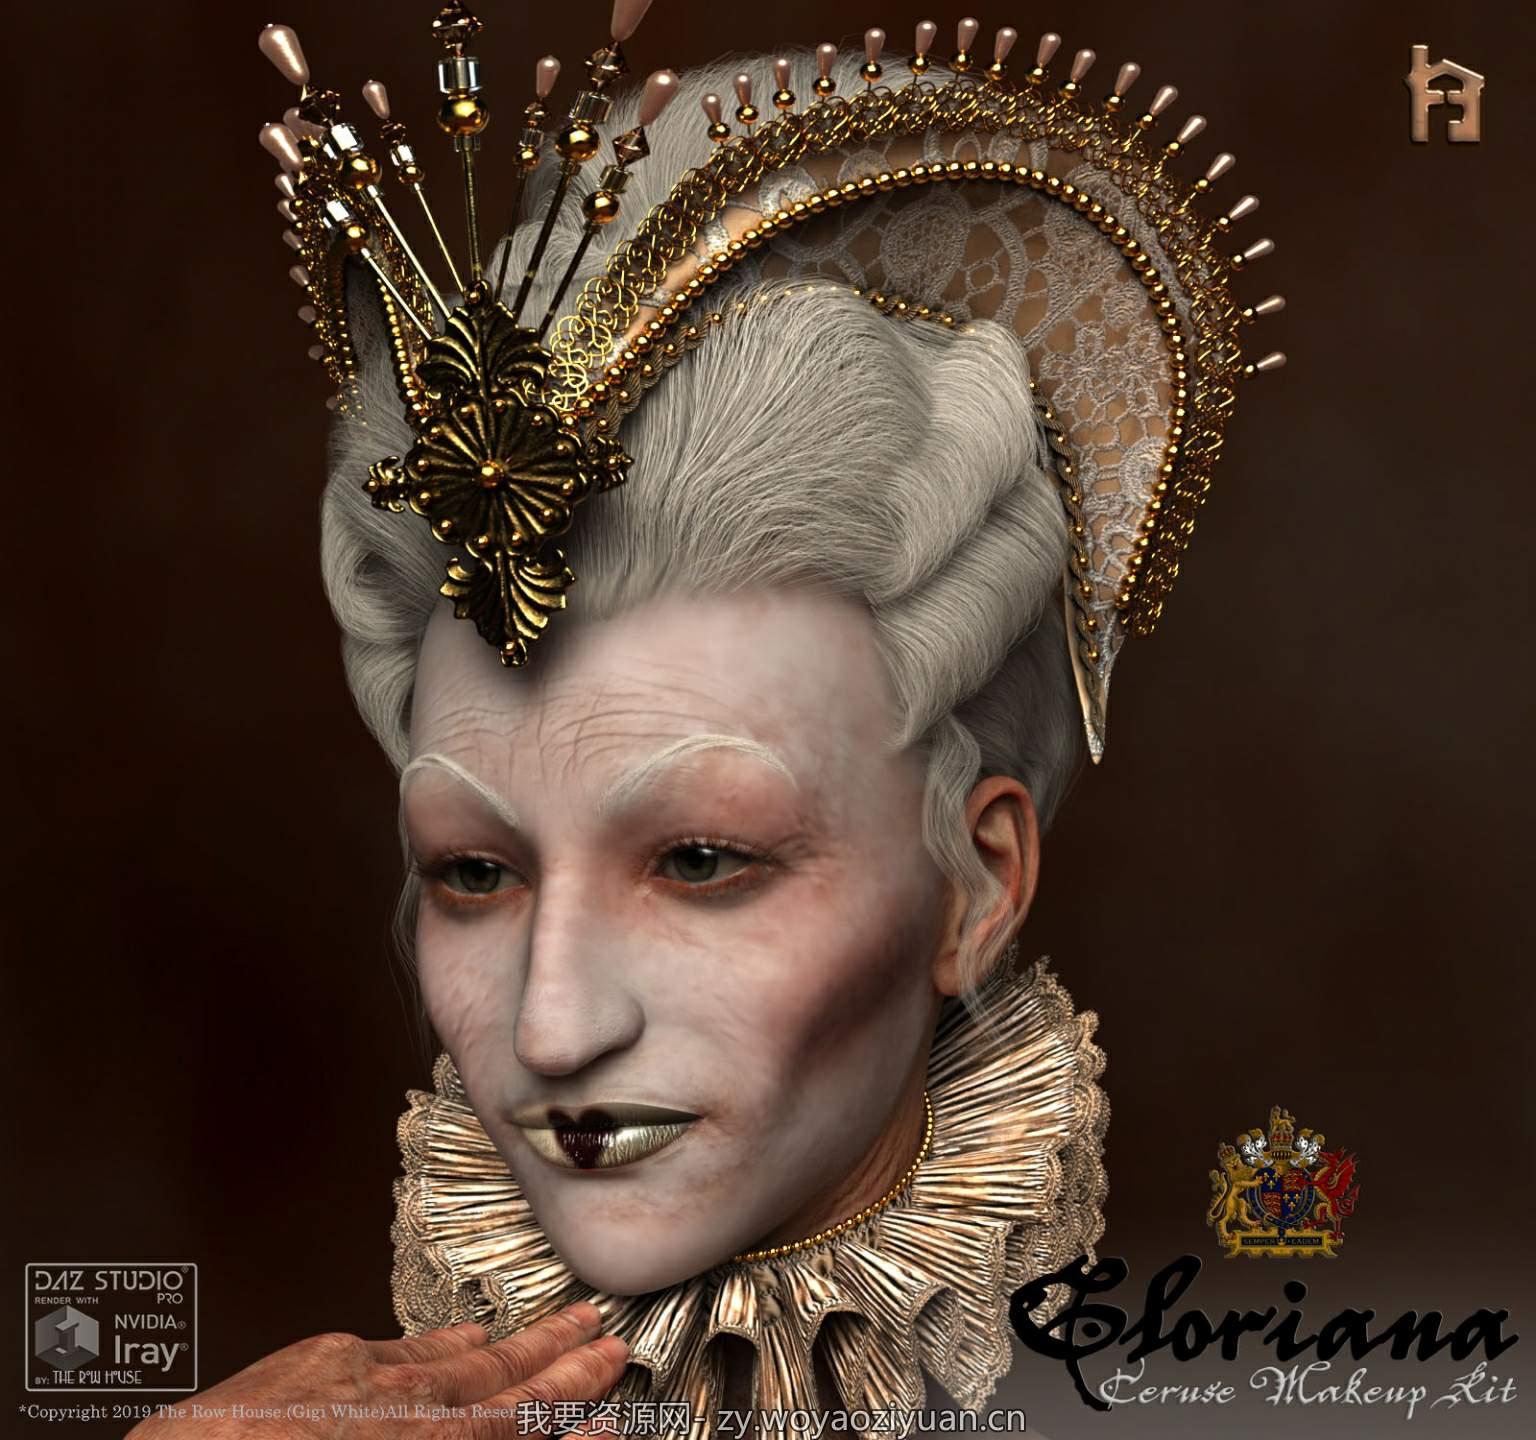 Gloriana Venetian Ceruse Makeup Kit